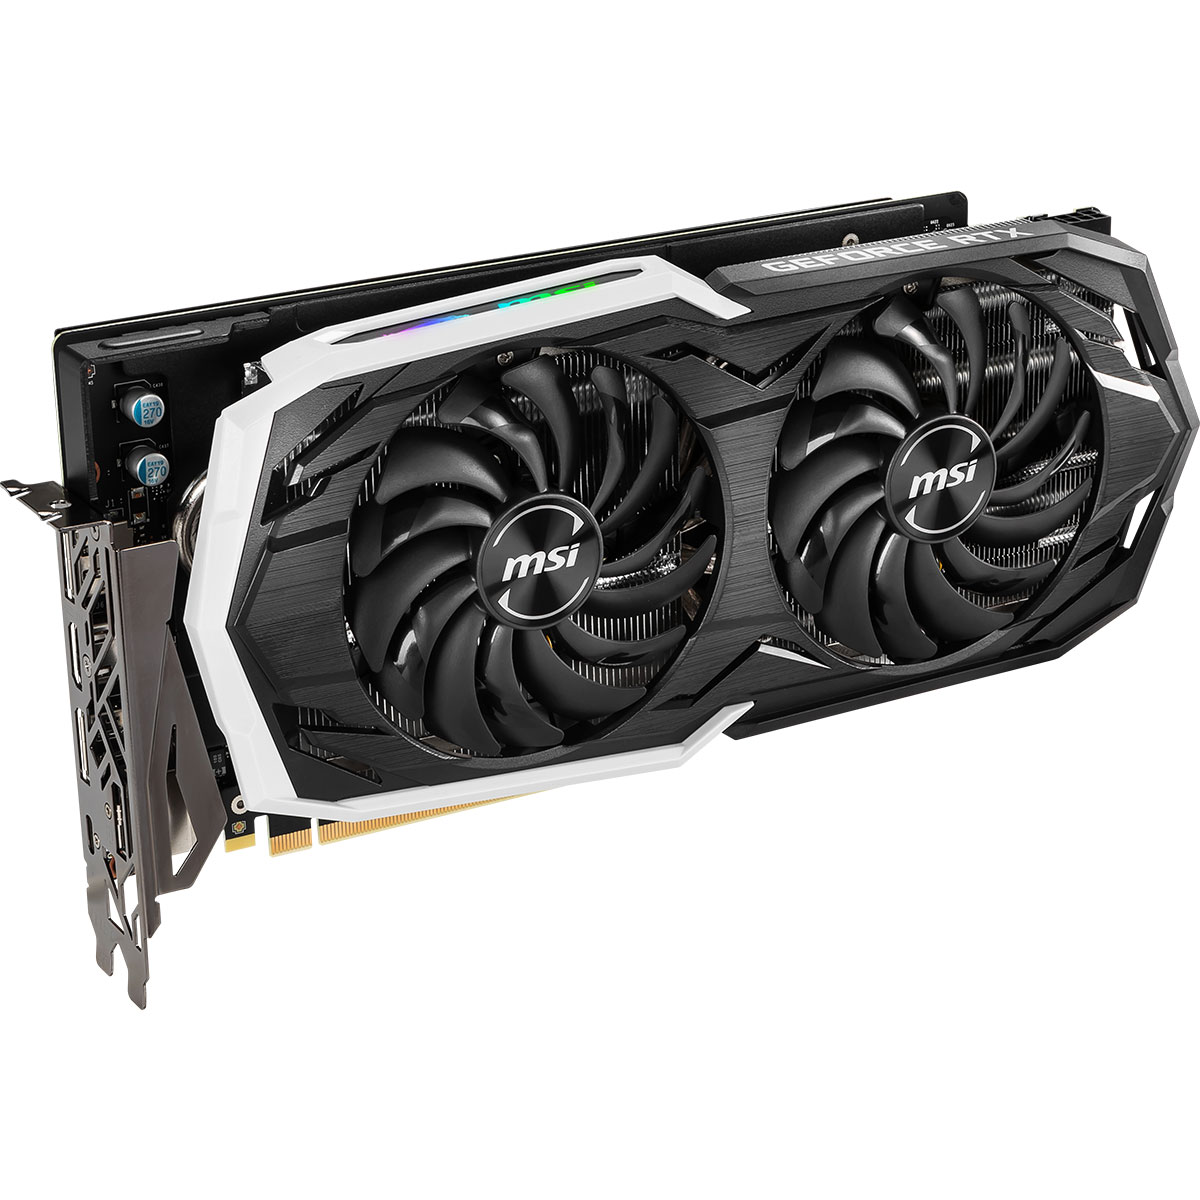 GeForce RTX 2070 ARMOR 8G OC (912-V373-226 --) - Achat / Vente Carte graphique sur Picata.fr - 4